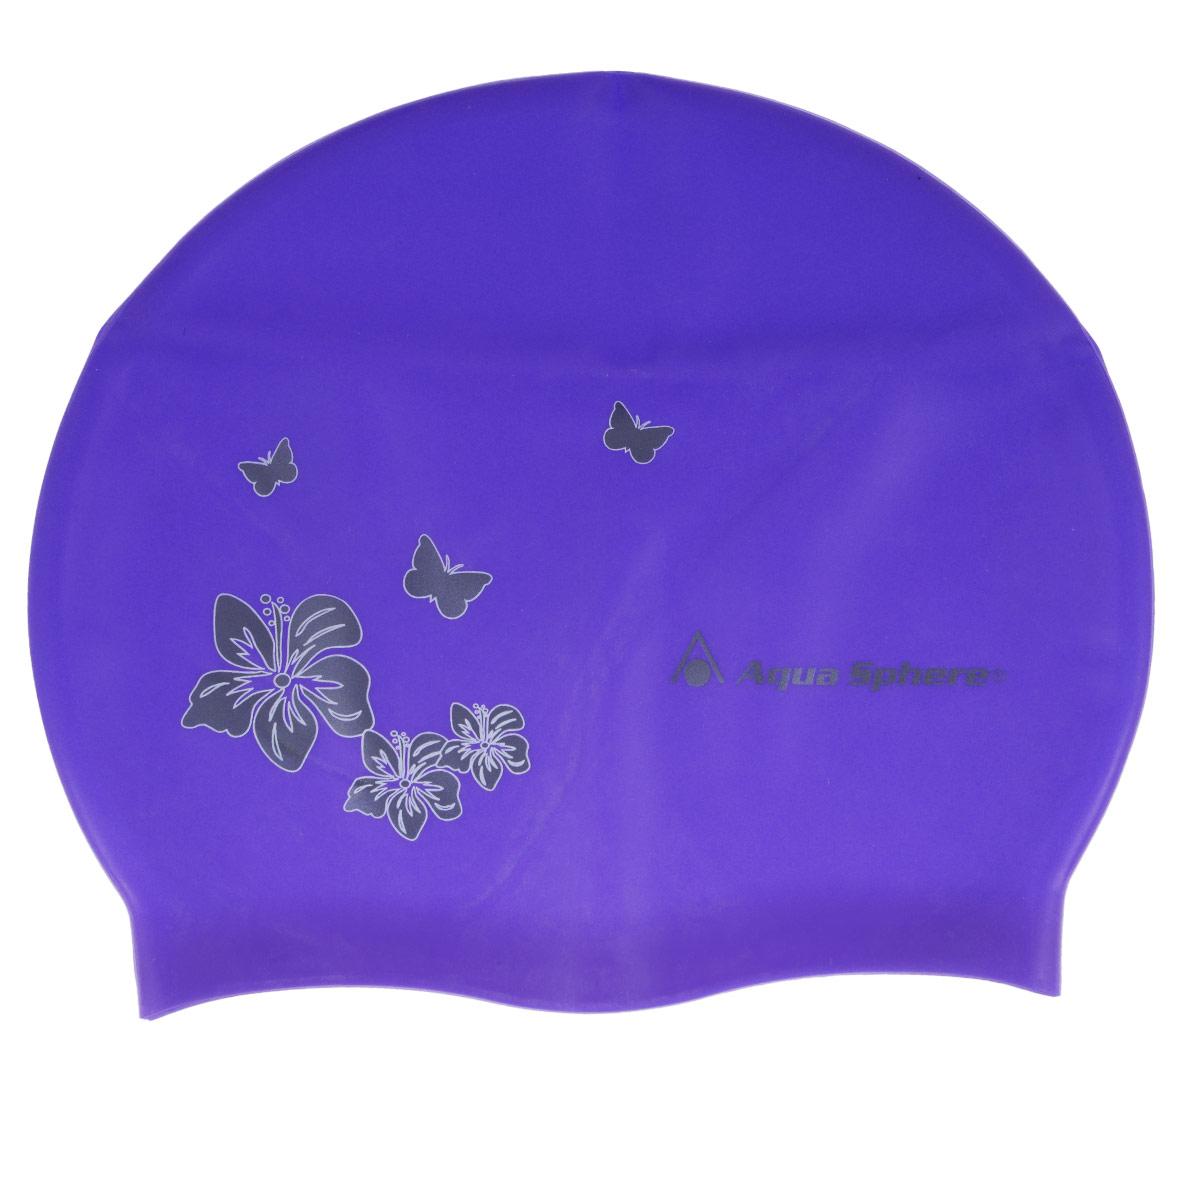 "Aqua Sphere Шапочка для плавания Aqua Sphere ""Dahlia"", взрослая, цвет: бирюзовый"